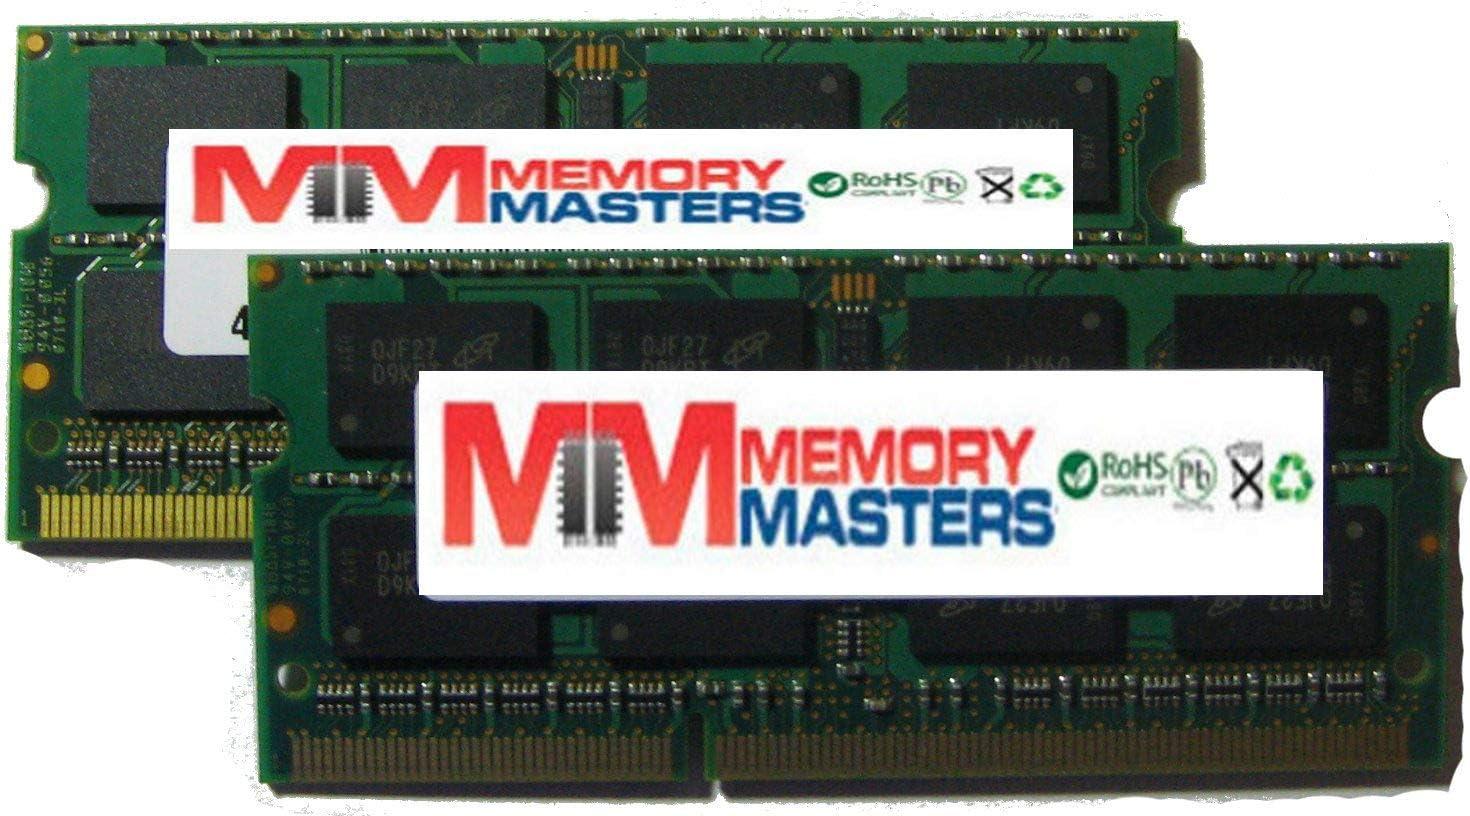 MemoryMasters 8GB 2X4GB Memory for Acer Aspire 7741Z-4643 DDR3 PC3-8500 1066MHz RAM (MemoryMasters)